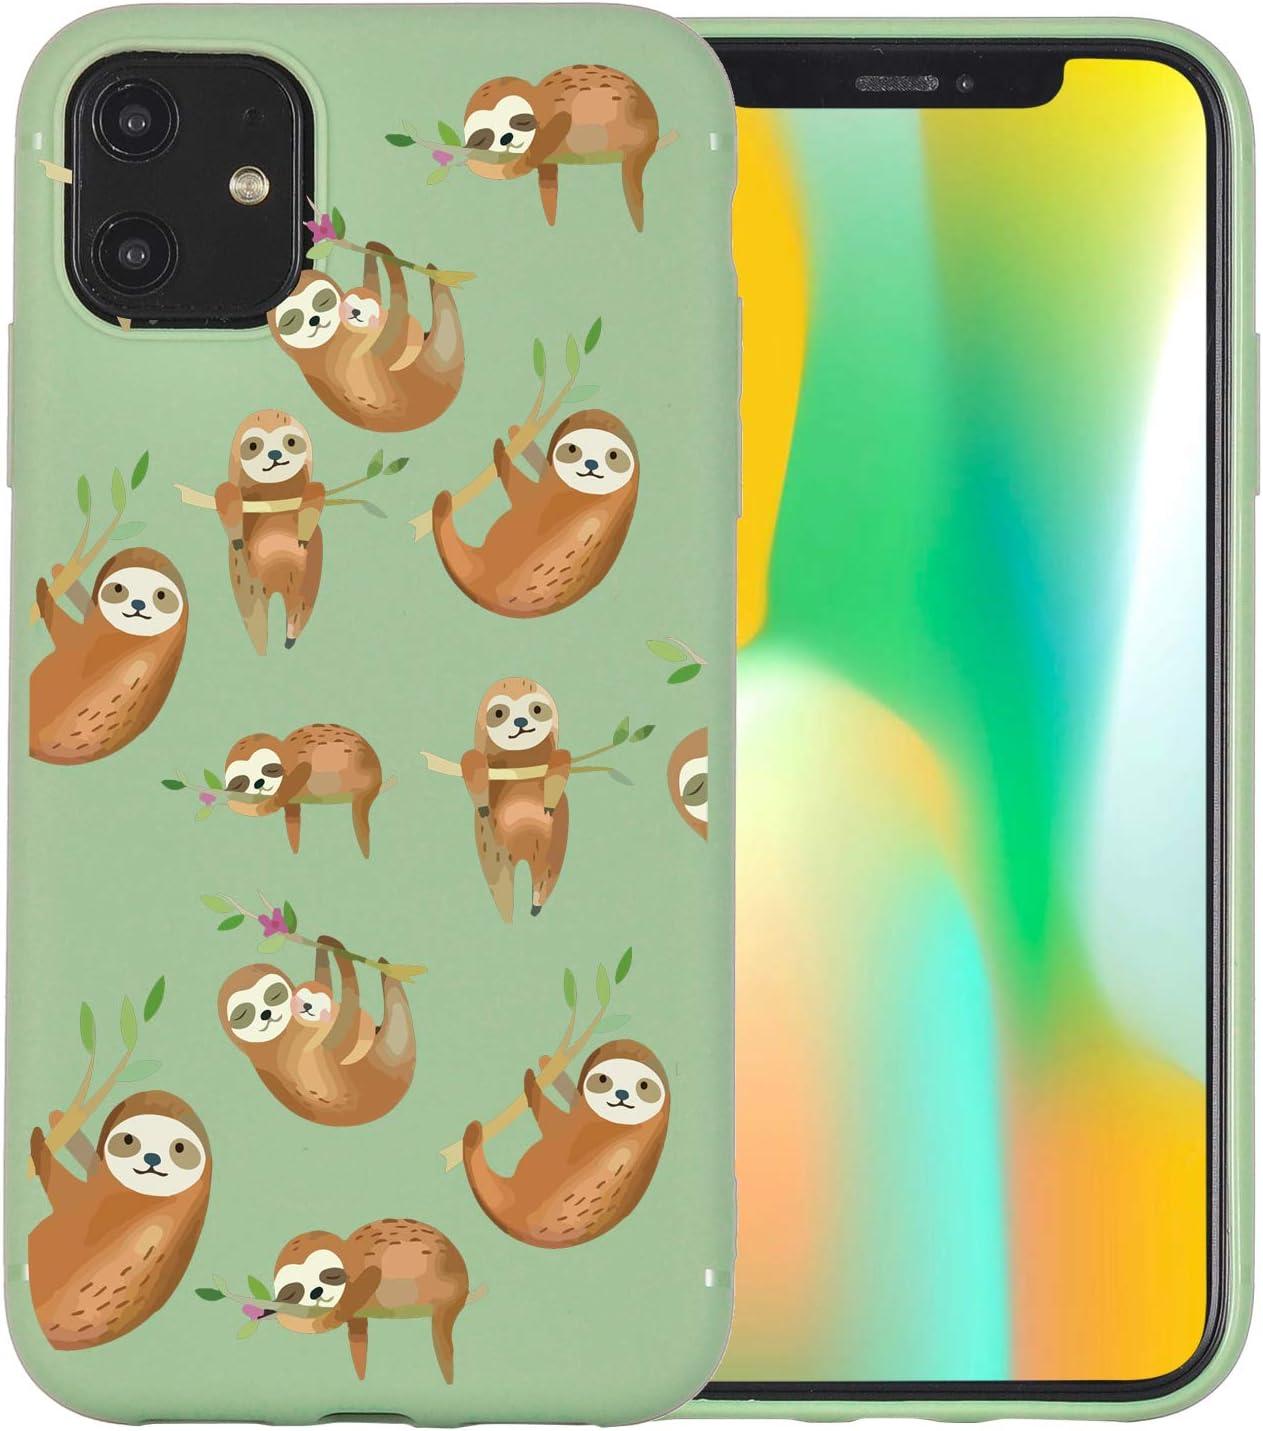 JOYLAND Avocado Green Case for iPhone 7 Plus/8 Plus Case Funny Sloth Tree Phone Cover Flexible Soft TPU Bumper Cute Case for iPhone 7 Plus/8 Plus